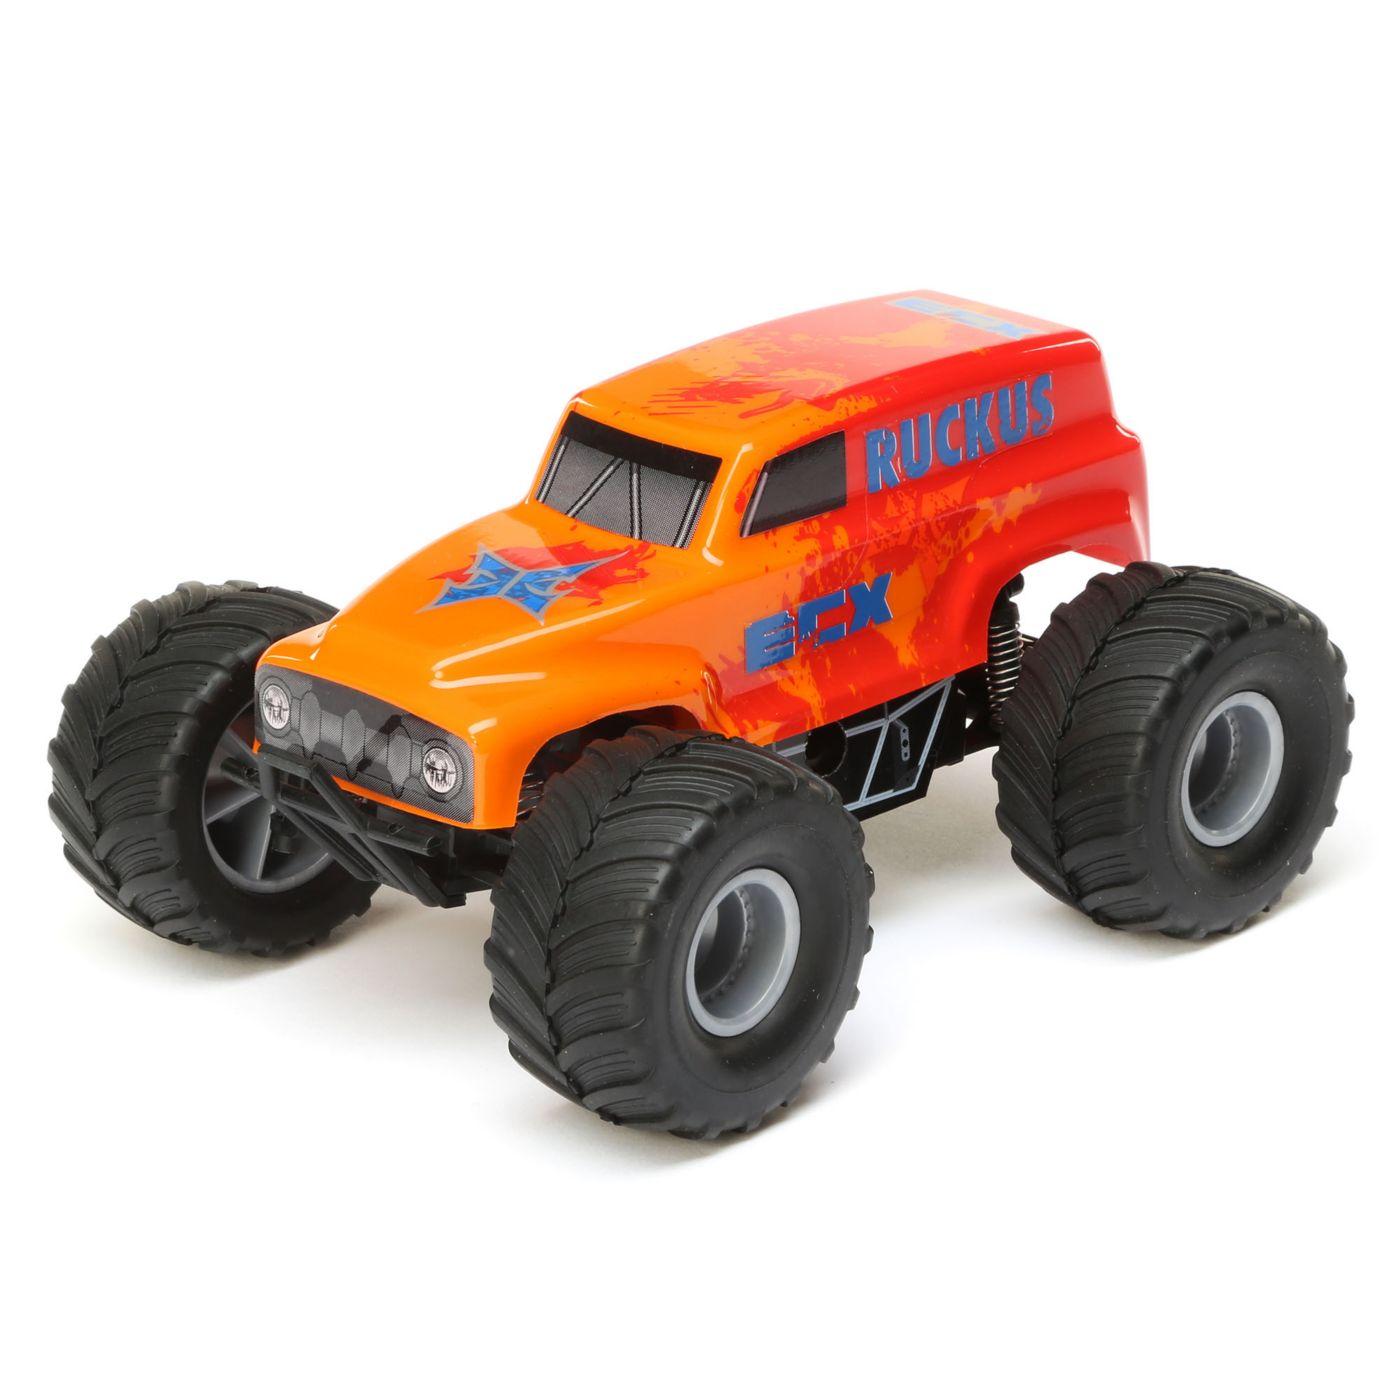 ECX Micro Ruckus 1/28-scale Monster Truck